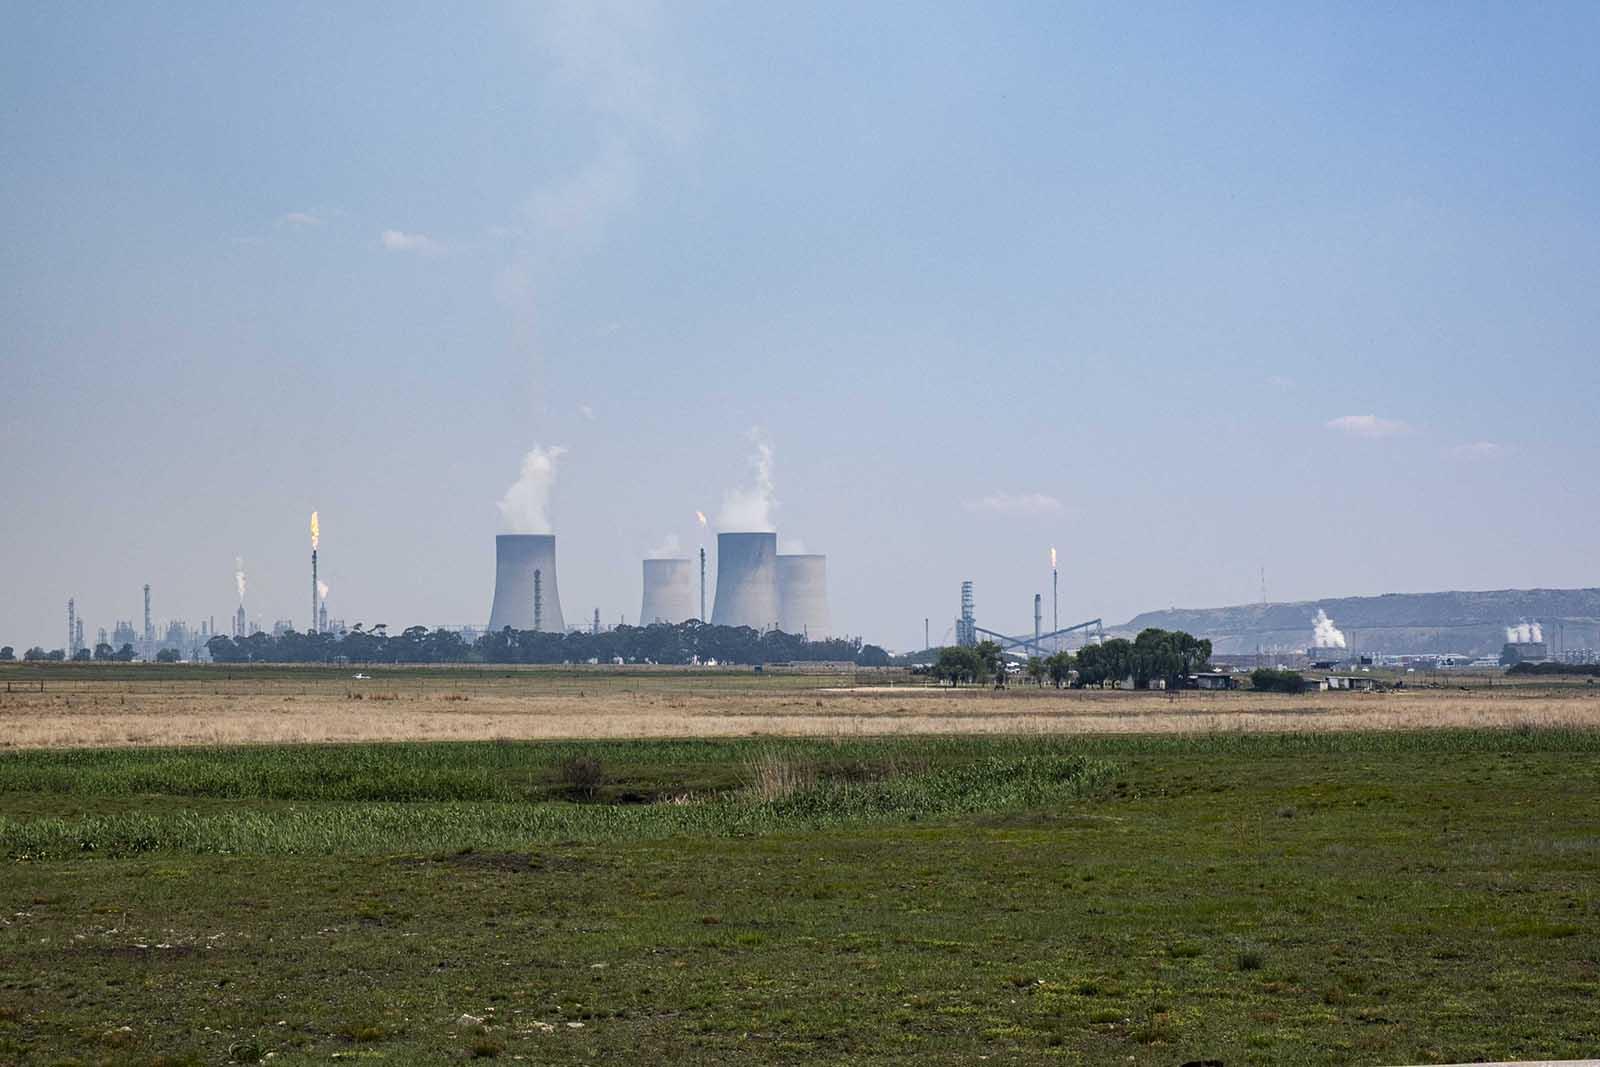 Coal-affected but also coal-dependent: Mpumalanga, the coal-mining hotspot